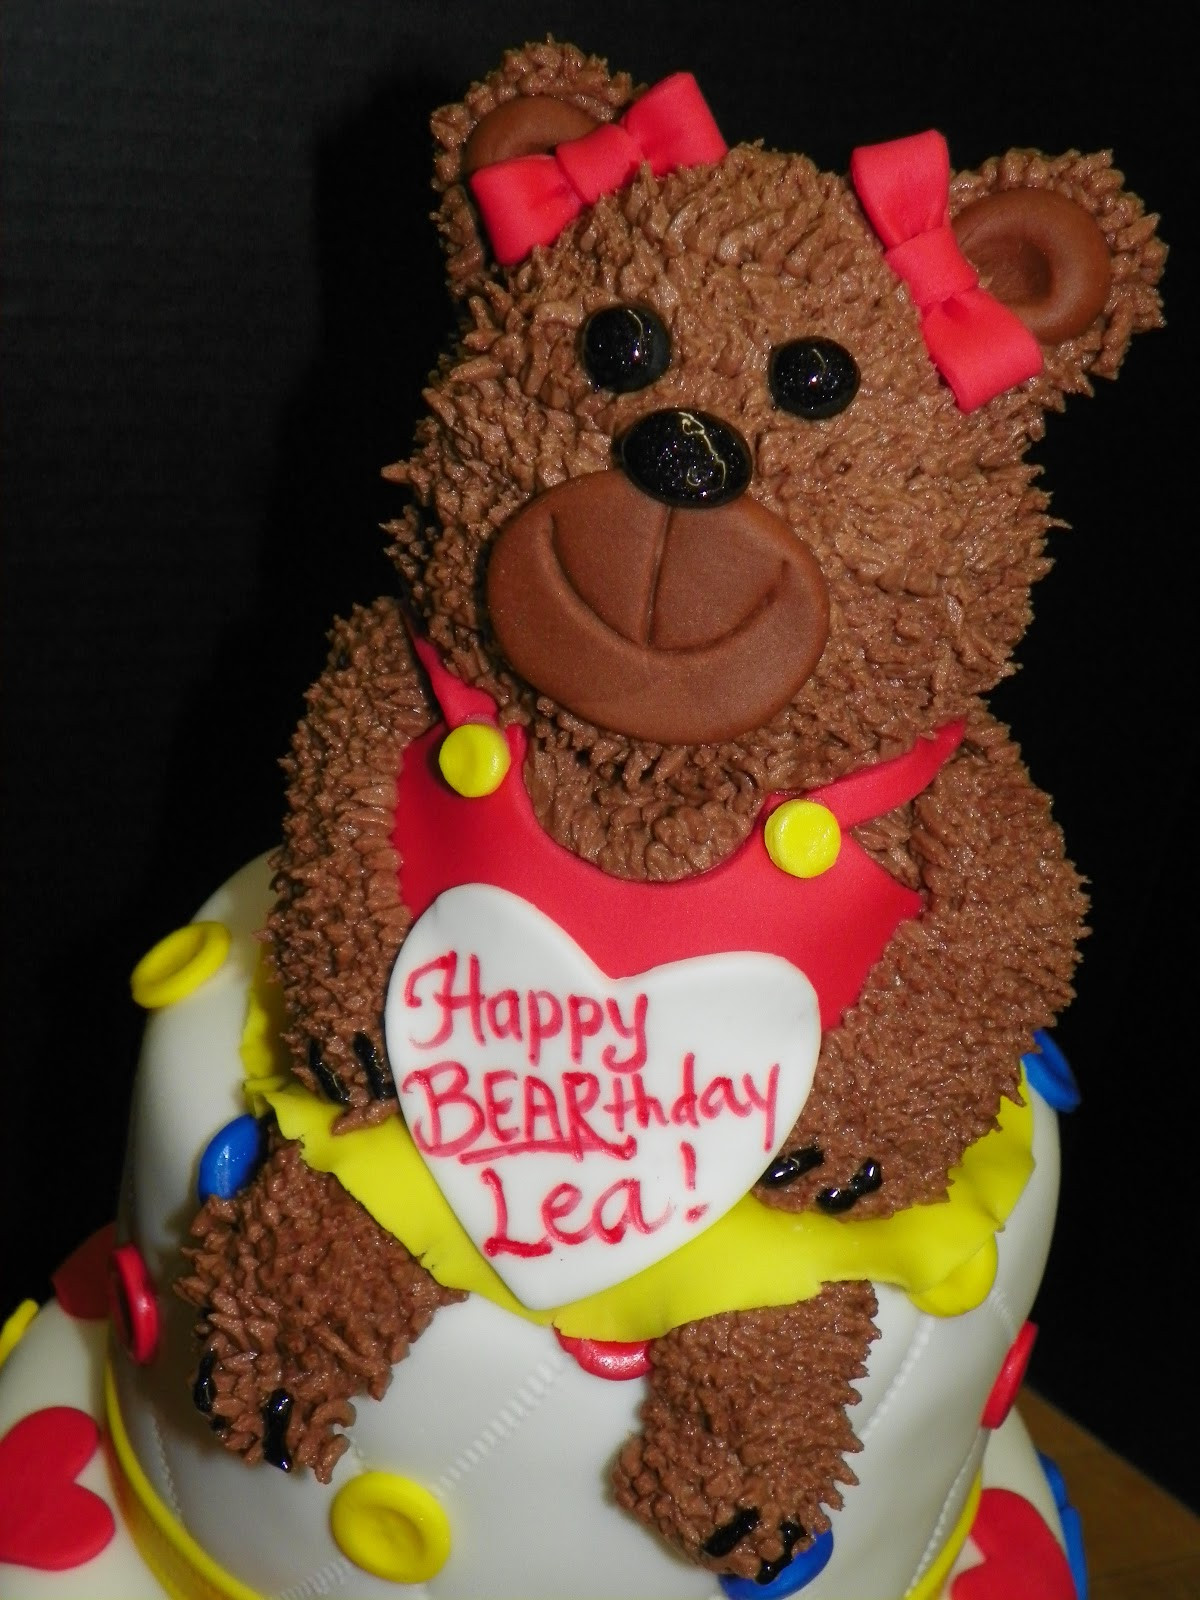 Bear Birthday Cake  Plumeria Cake Studio Build A Bear Birthday Cake